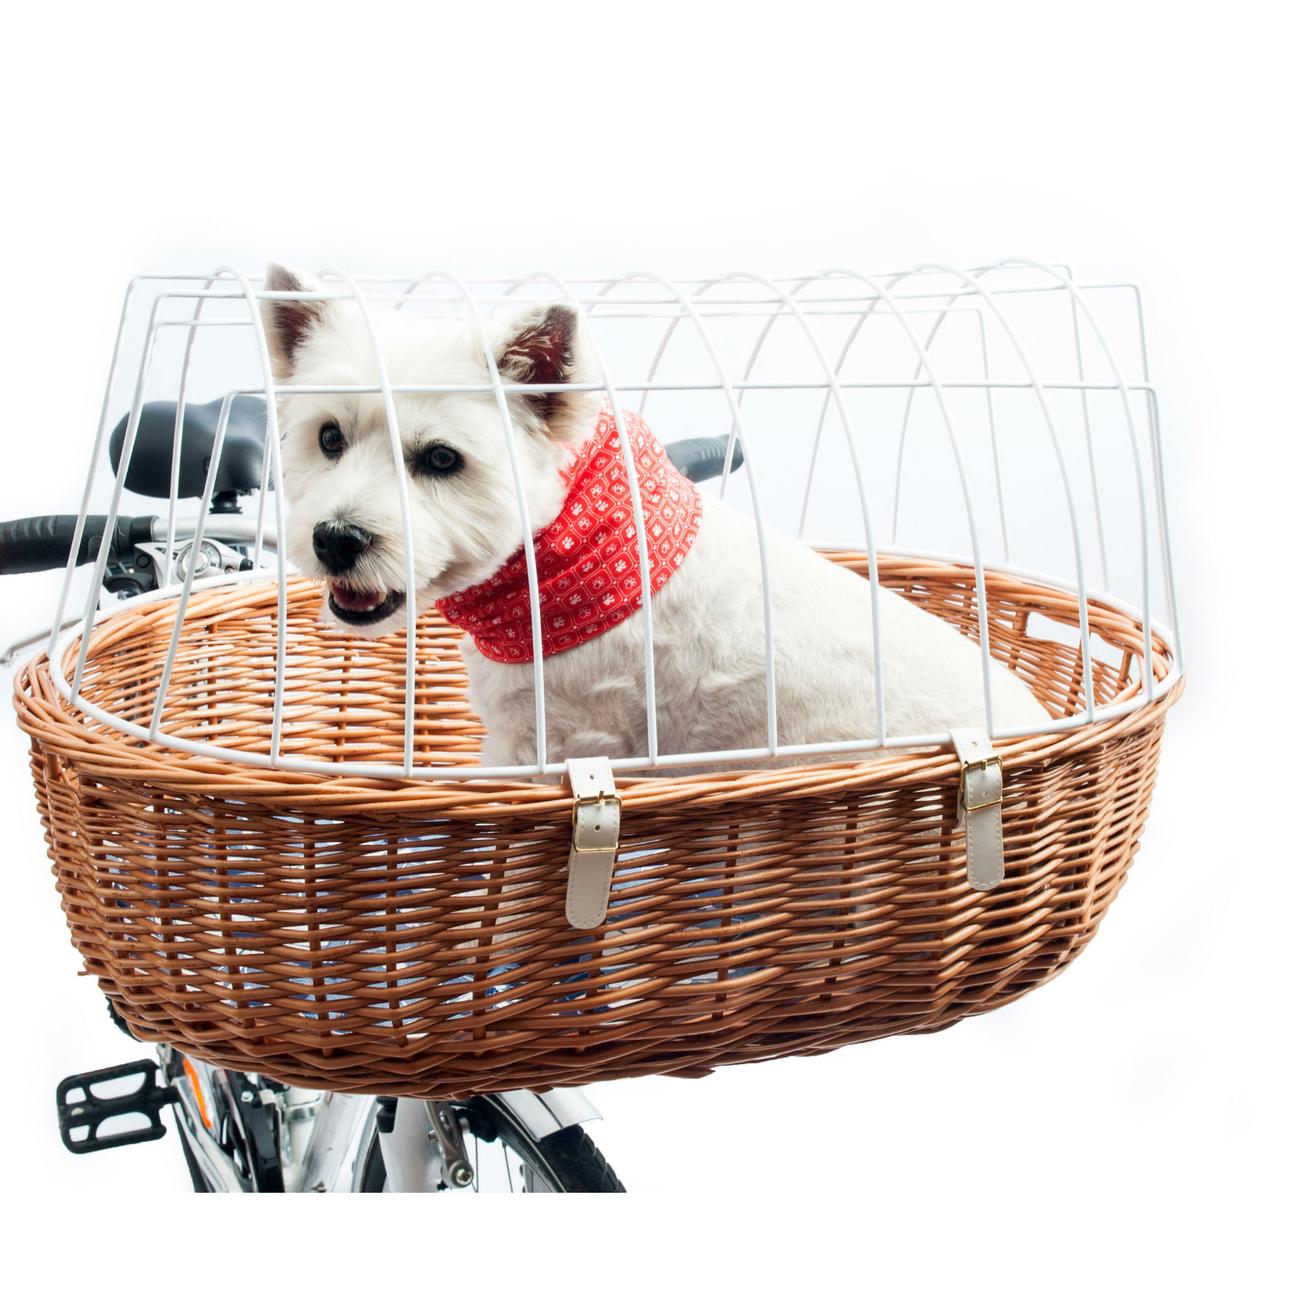 Aumüller E-Bike Hunde Fahrradkorb Standard vorne, 52 x 38 x 18/40 cm - inklusive Halterung, natur